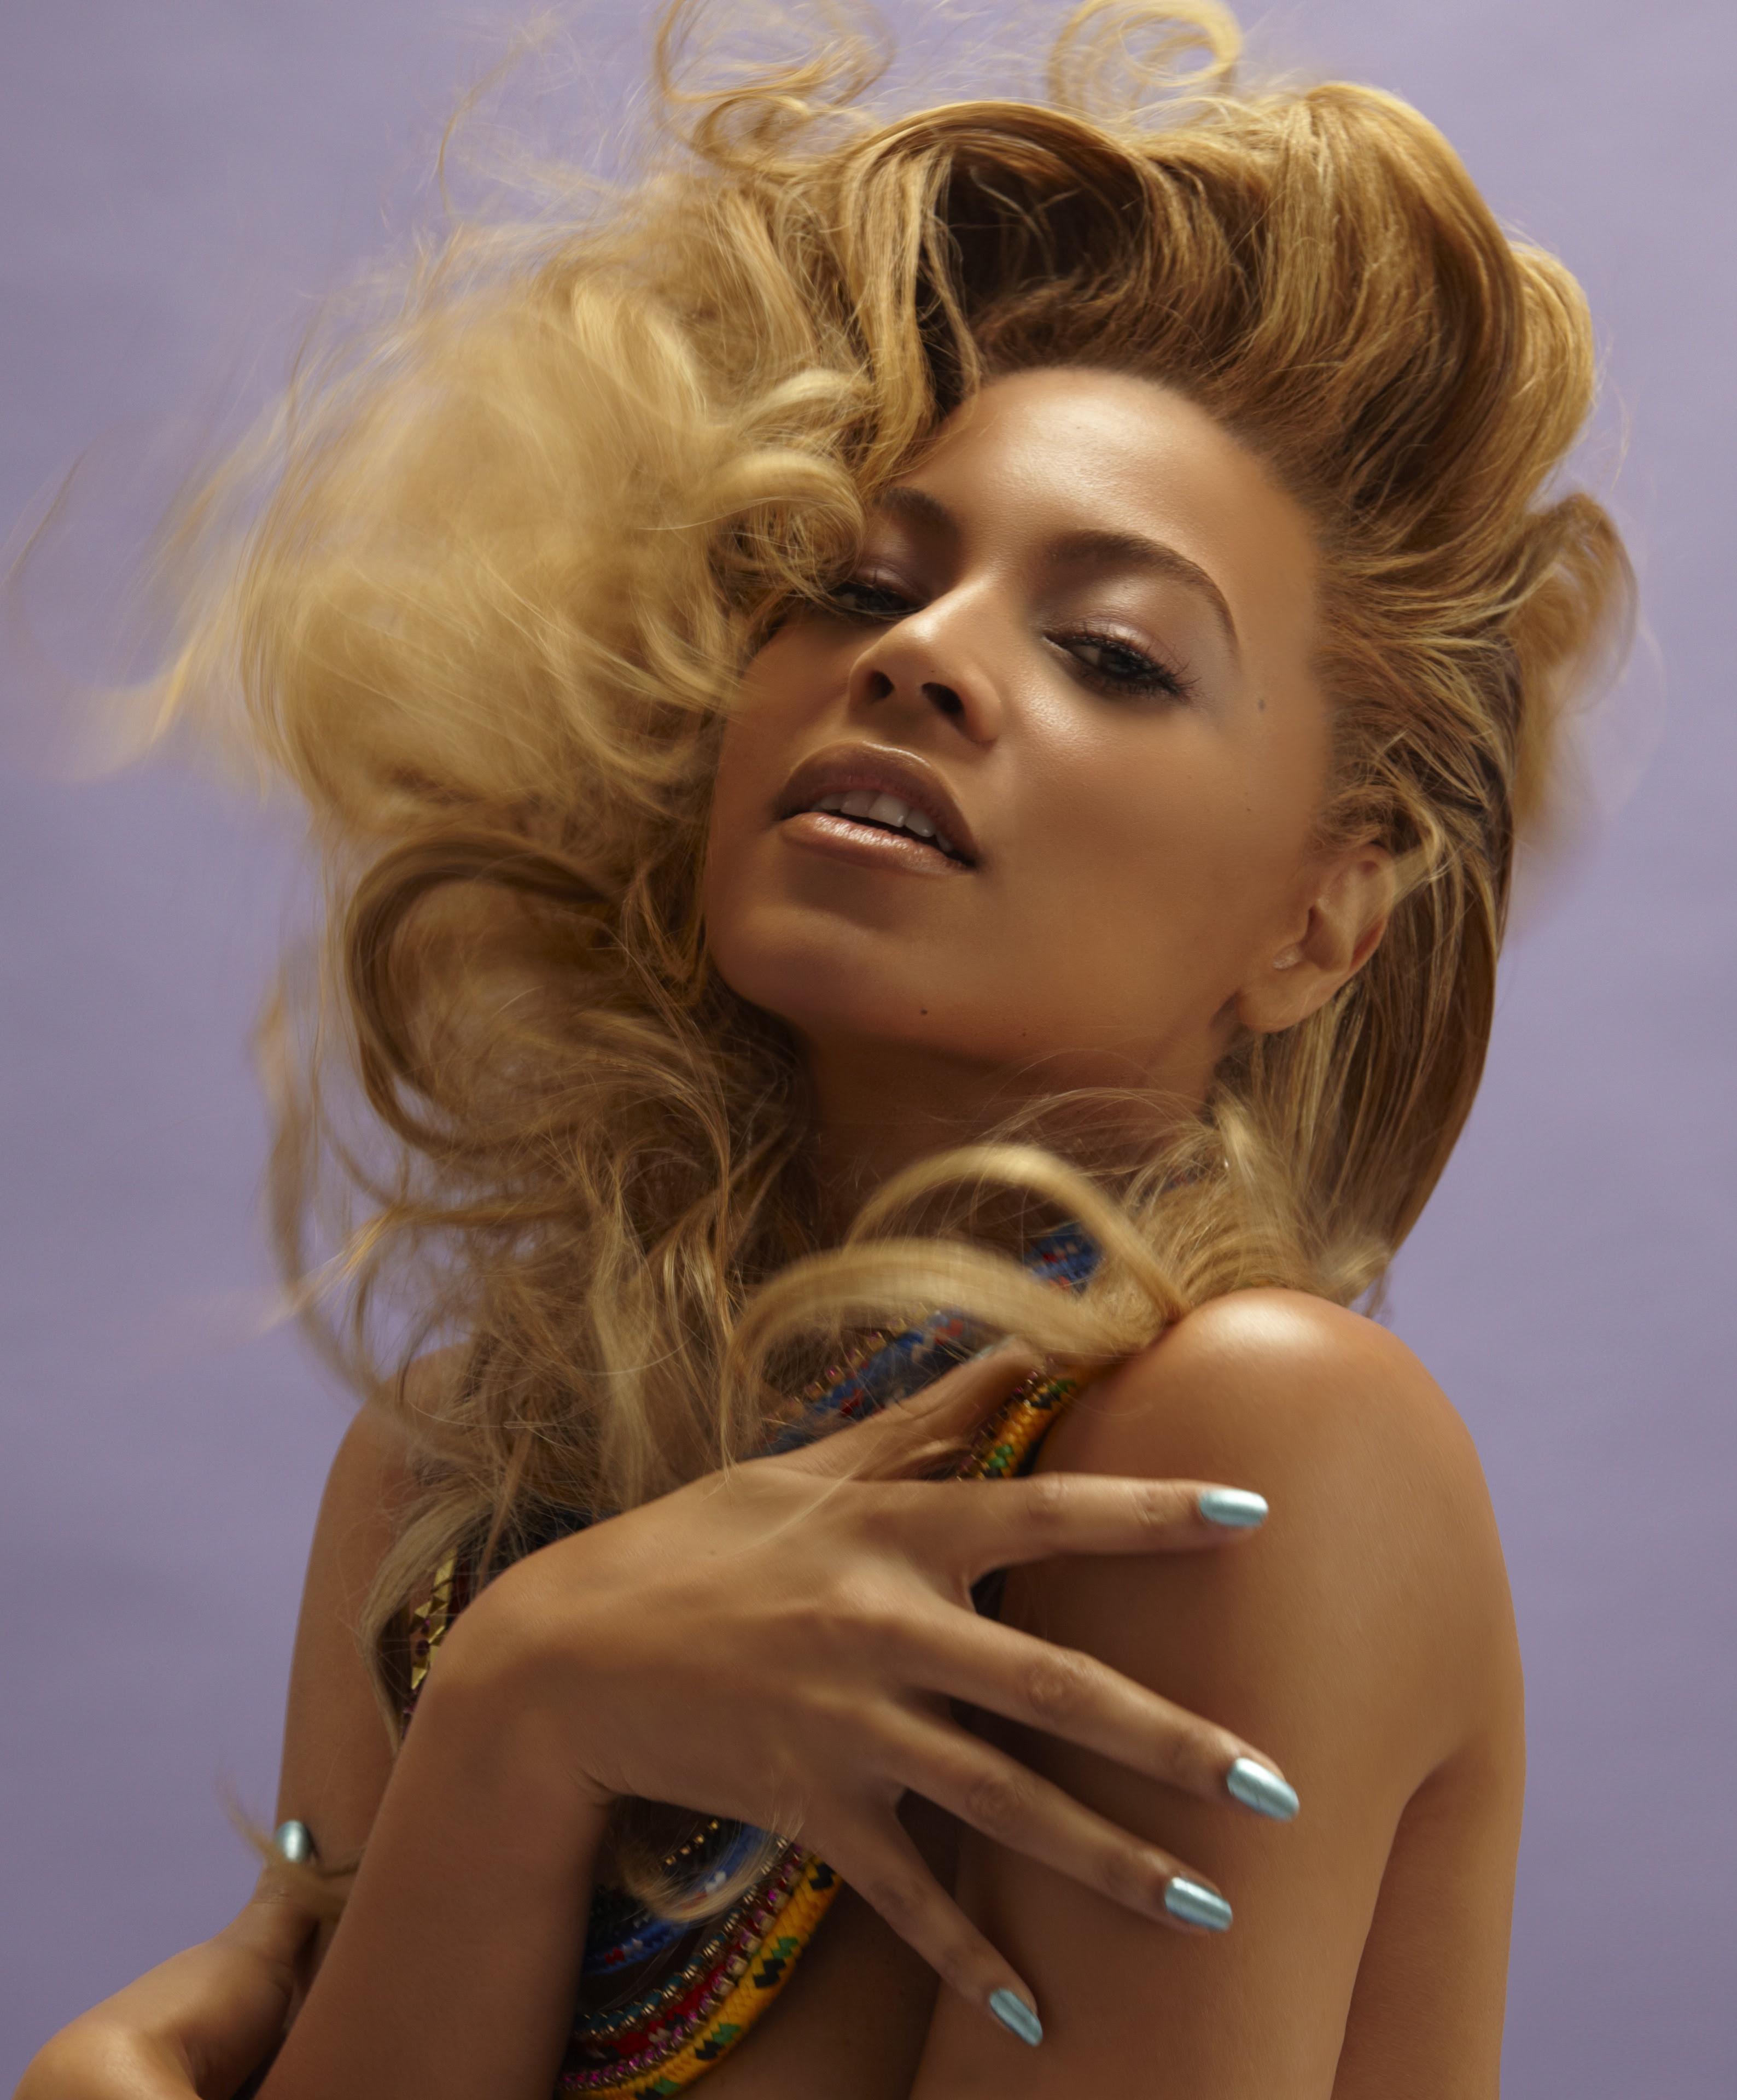 est100 一些攝影(some photos): Beyonce 碧昂斯